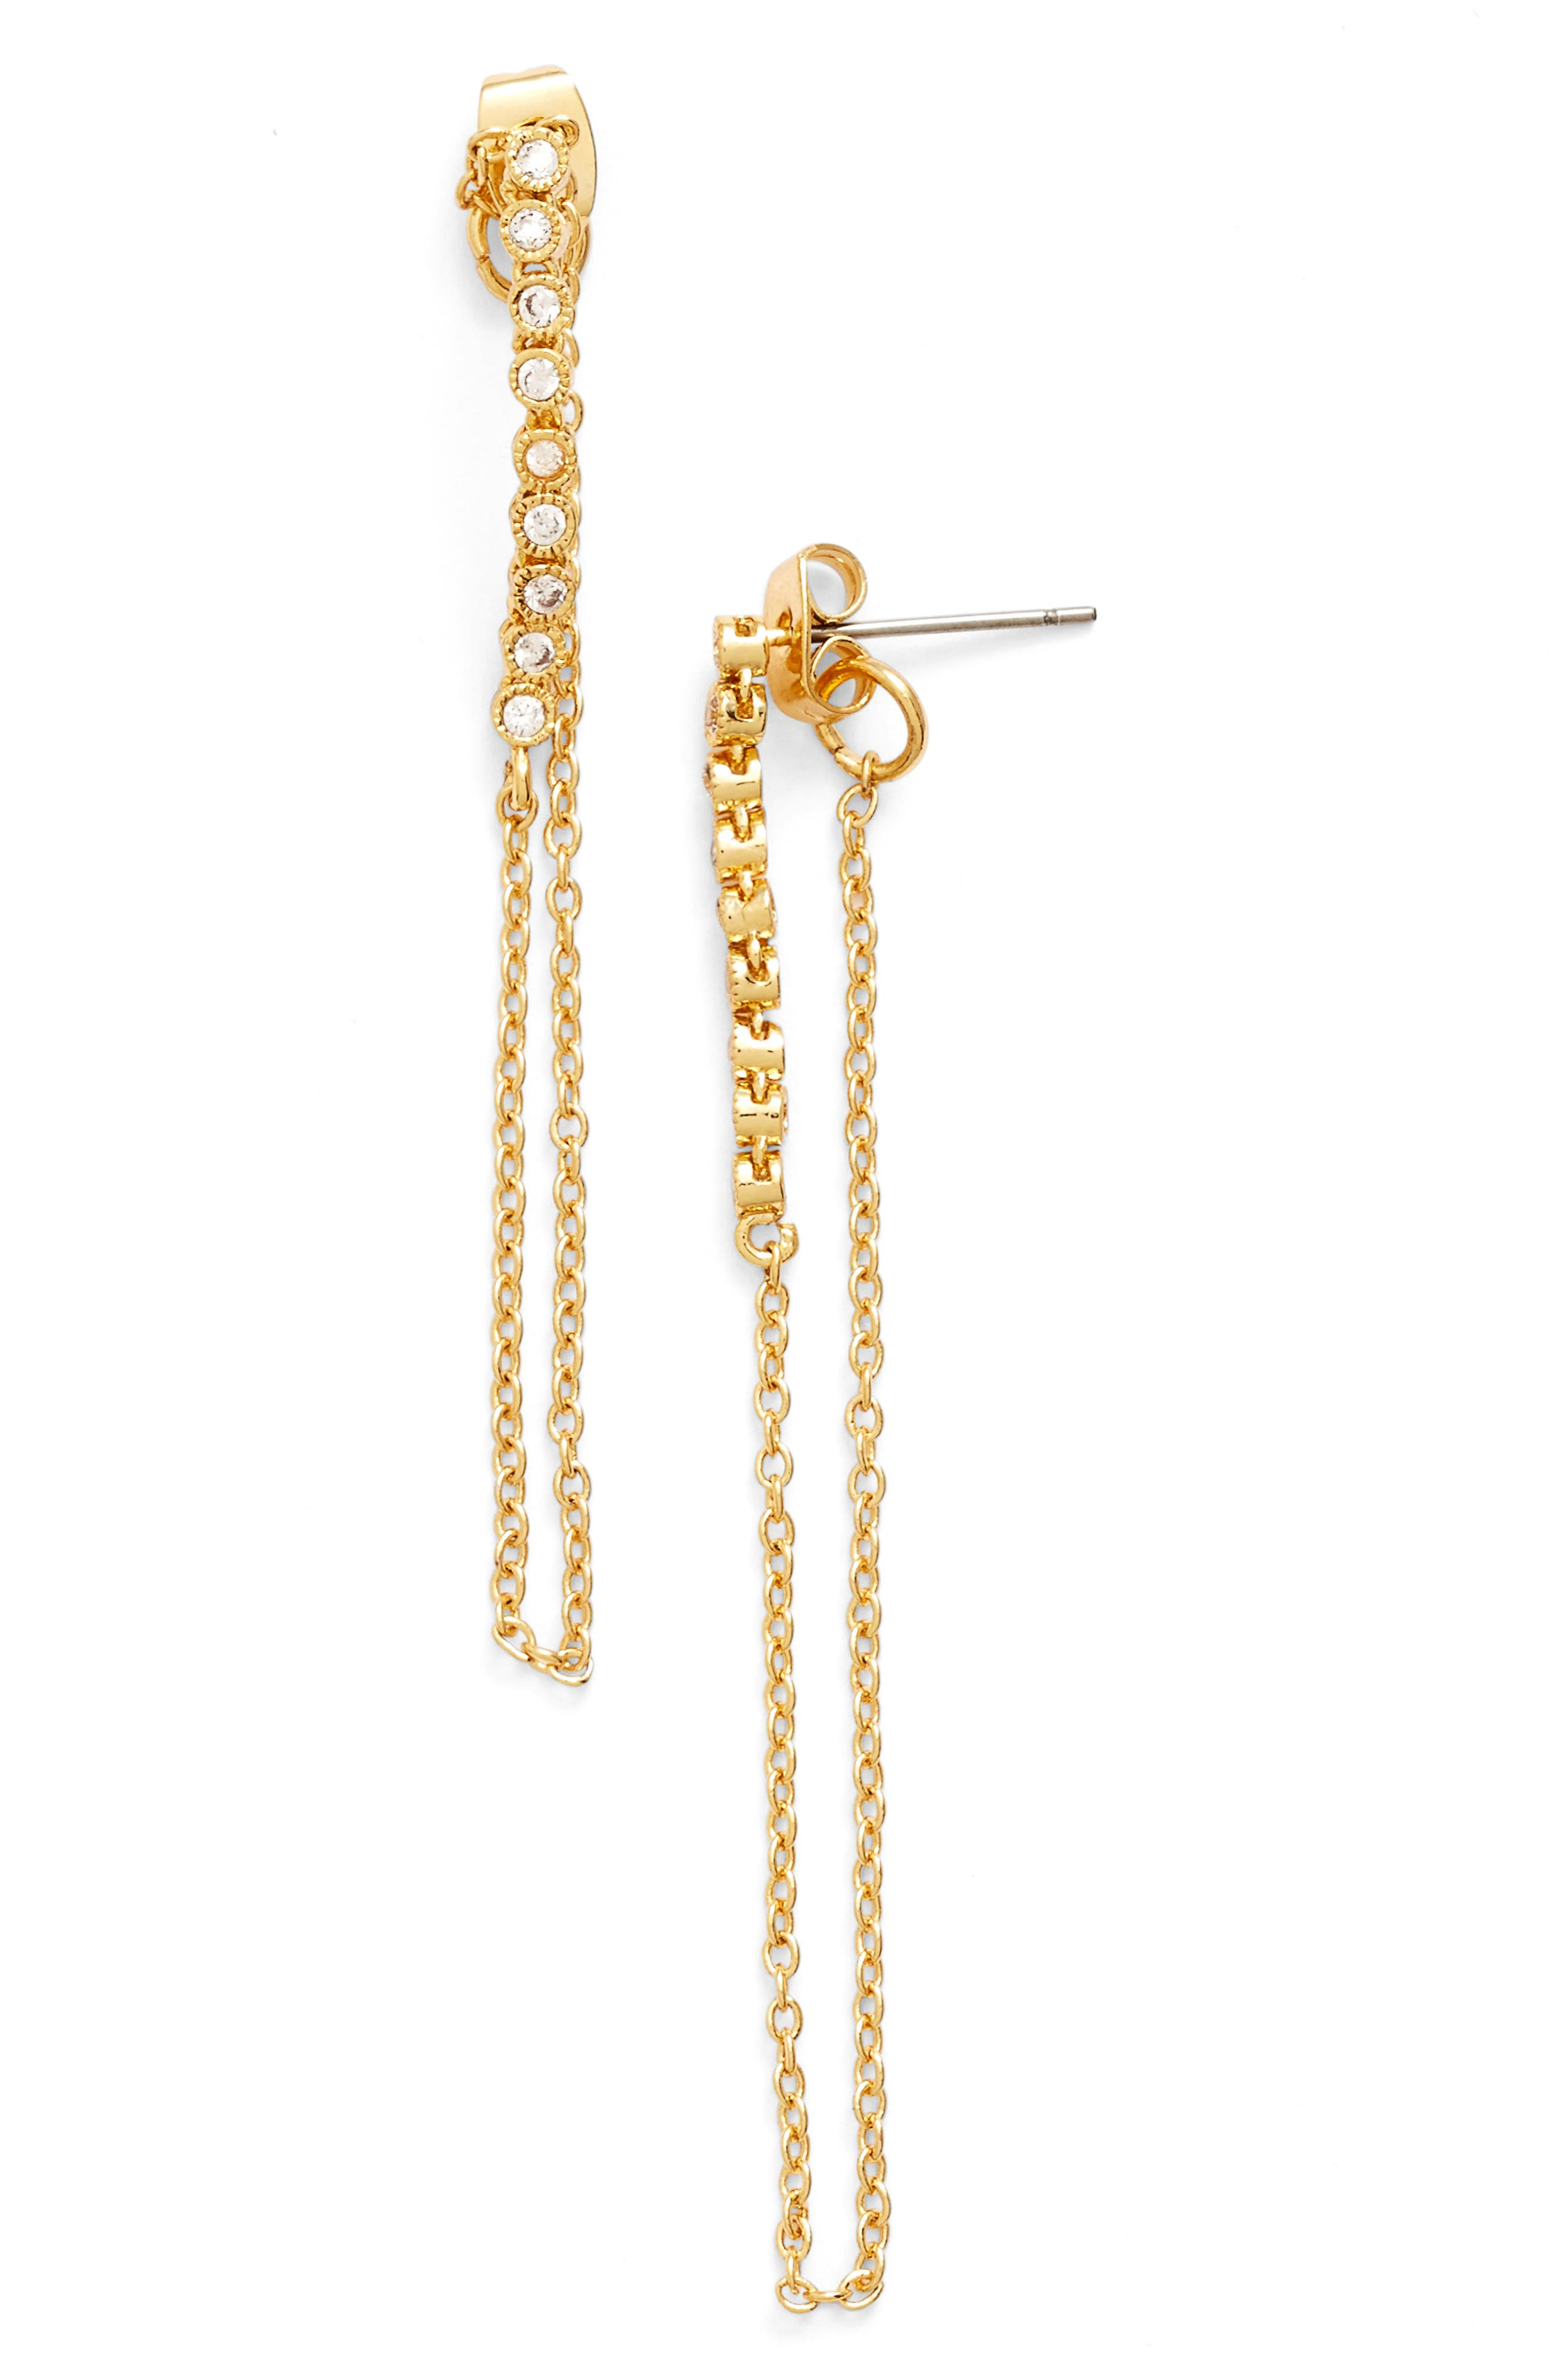 Crystal Chain Drop Earrings,                             Main thumbnail 1, color,                             710